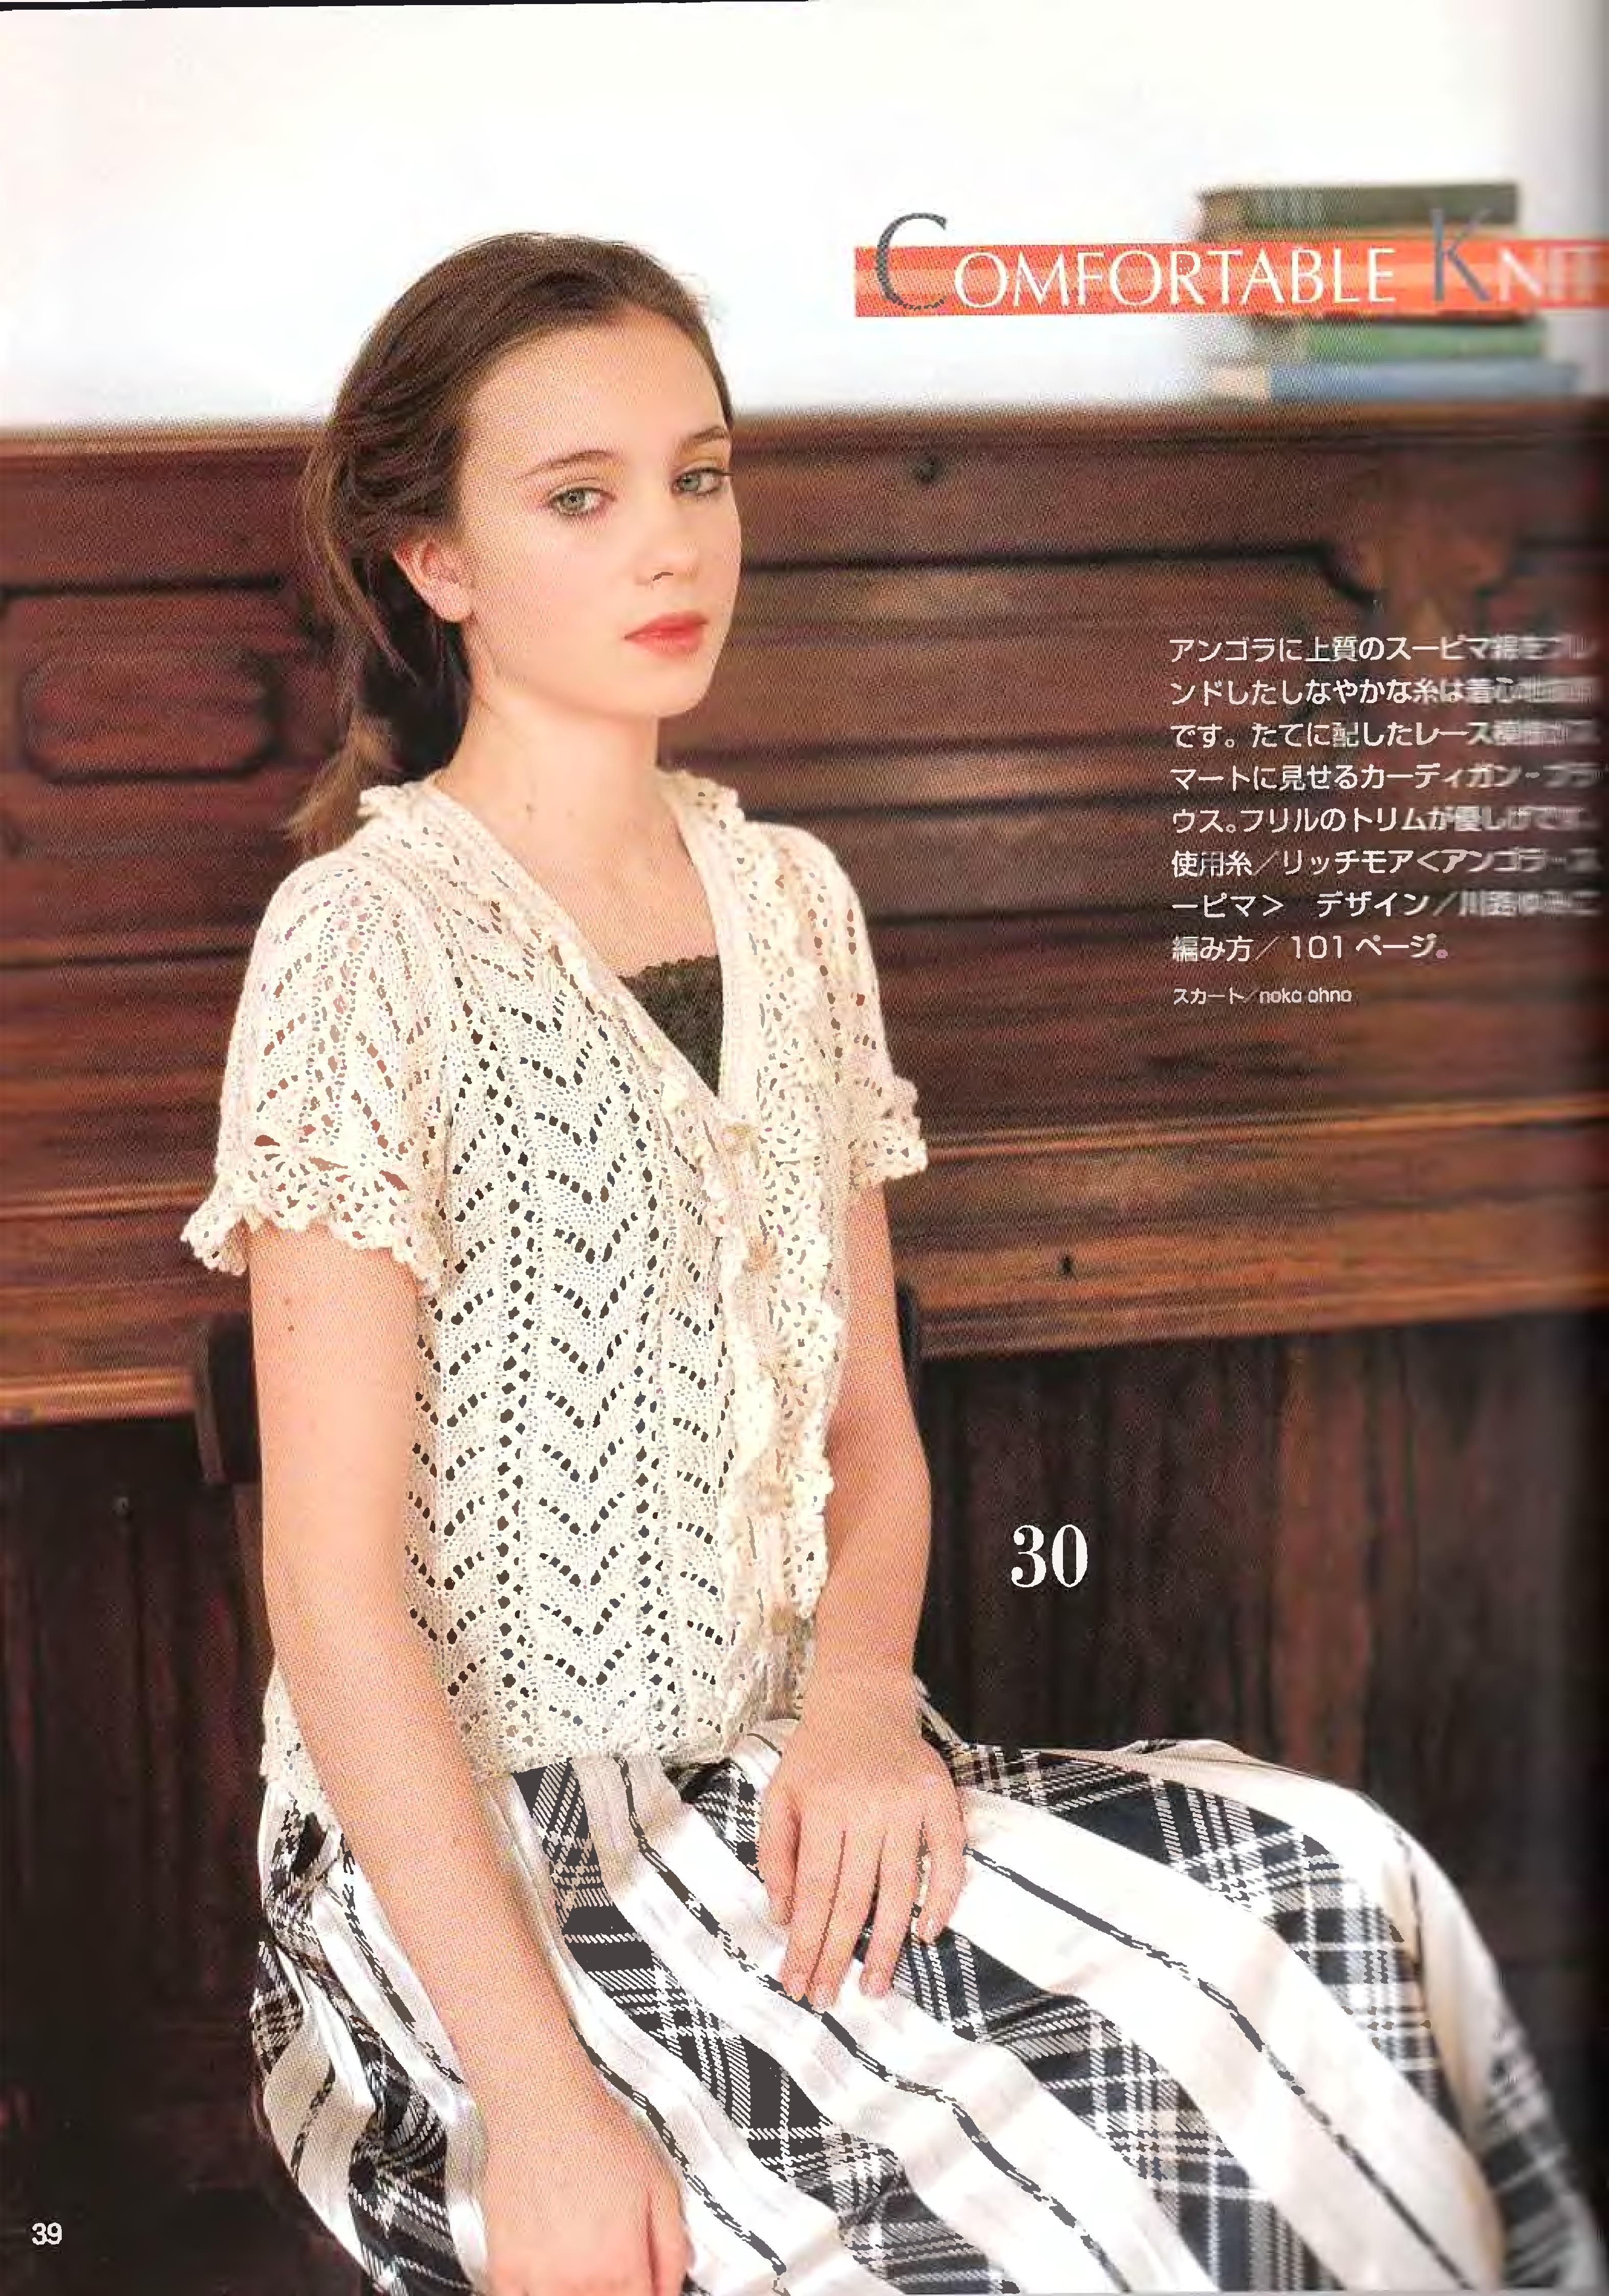 Lets-knit-series-NV4359-2008-Spring-Summer-sp-kr_37.jpg